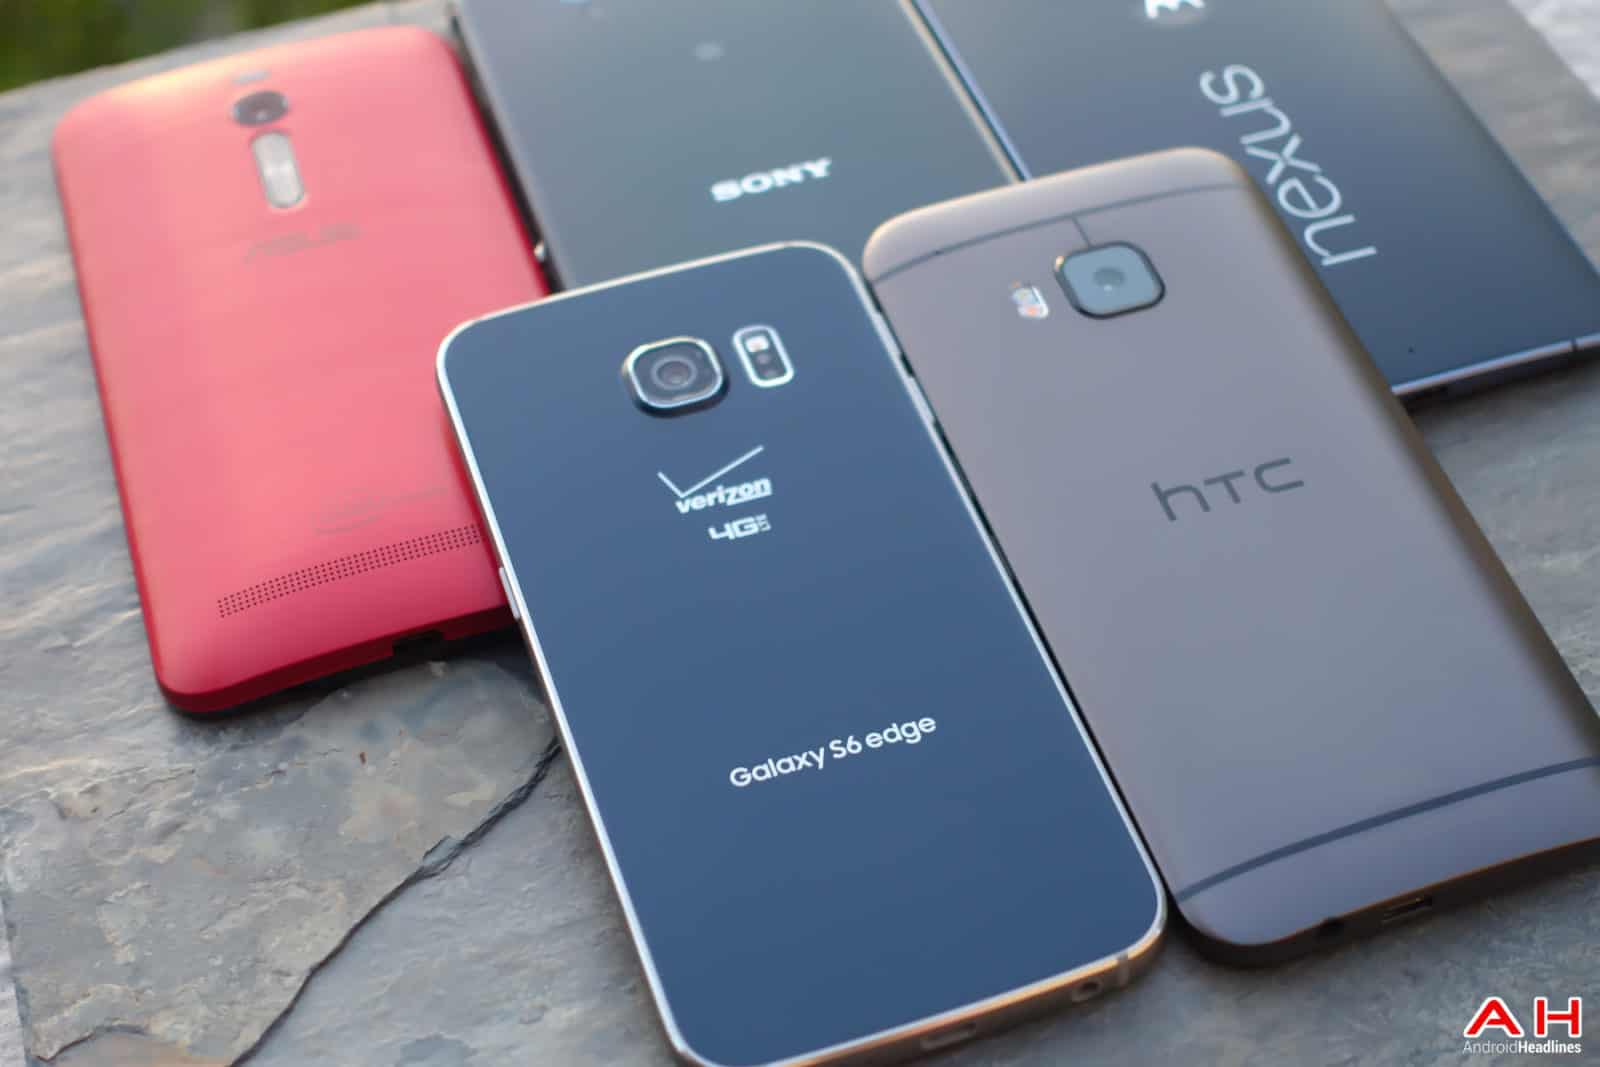 AH AH Android Samrtphones Nexus Samsung Galaxy S6 HTC One M9 Sony OEM logos-21 May 3rd Batch 2-9